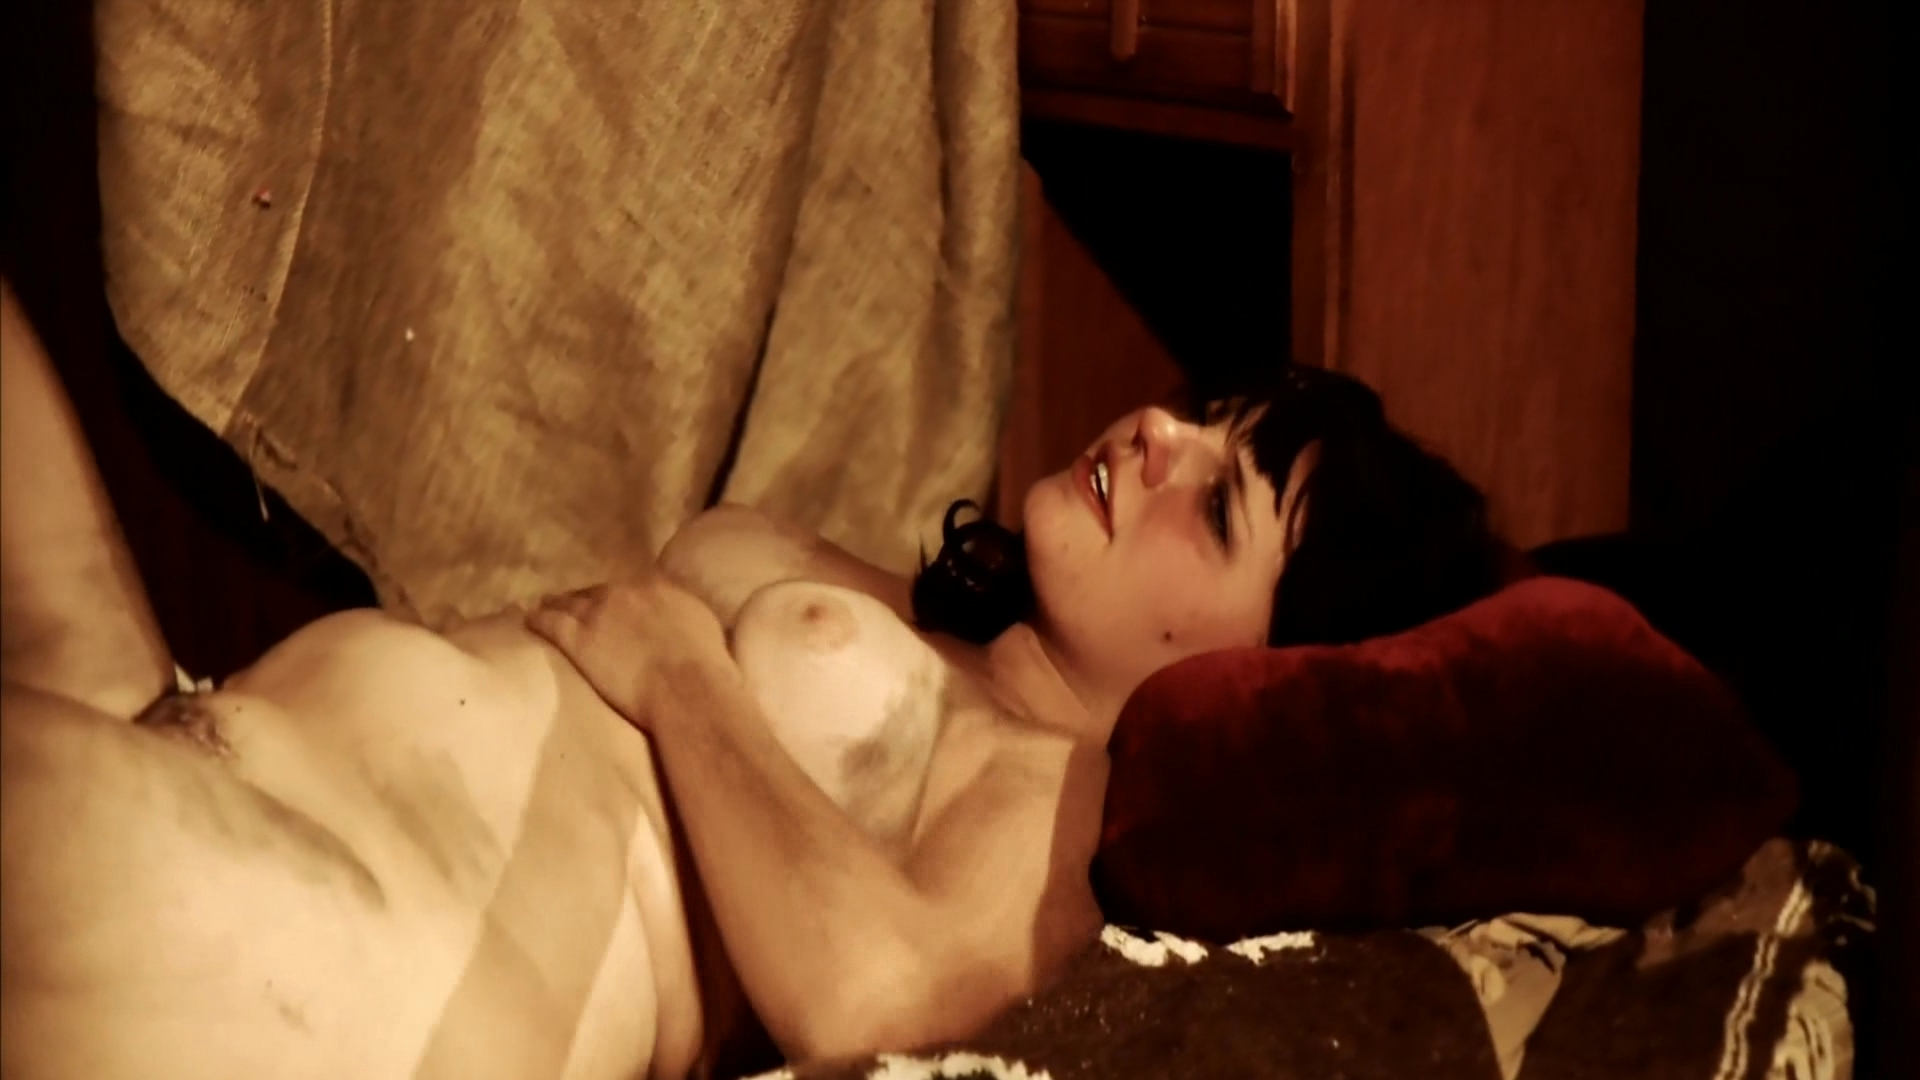 Amber Rowe, Dani Estenger - The Scarlet Worm 1920-1080 (9).jpg